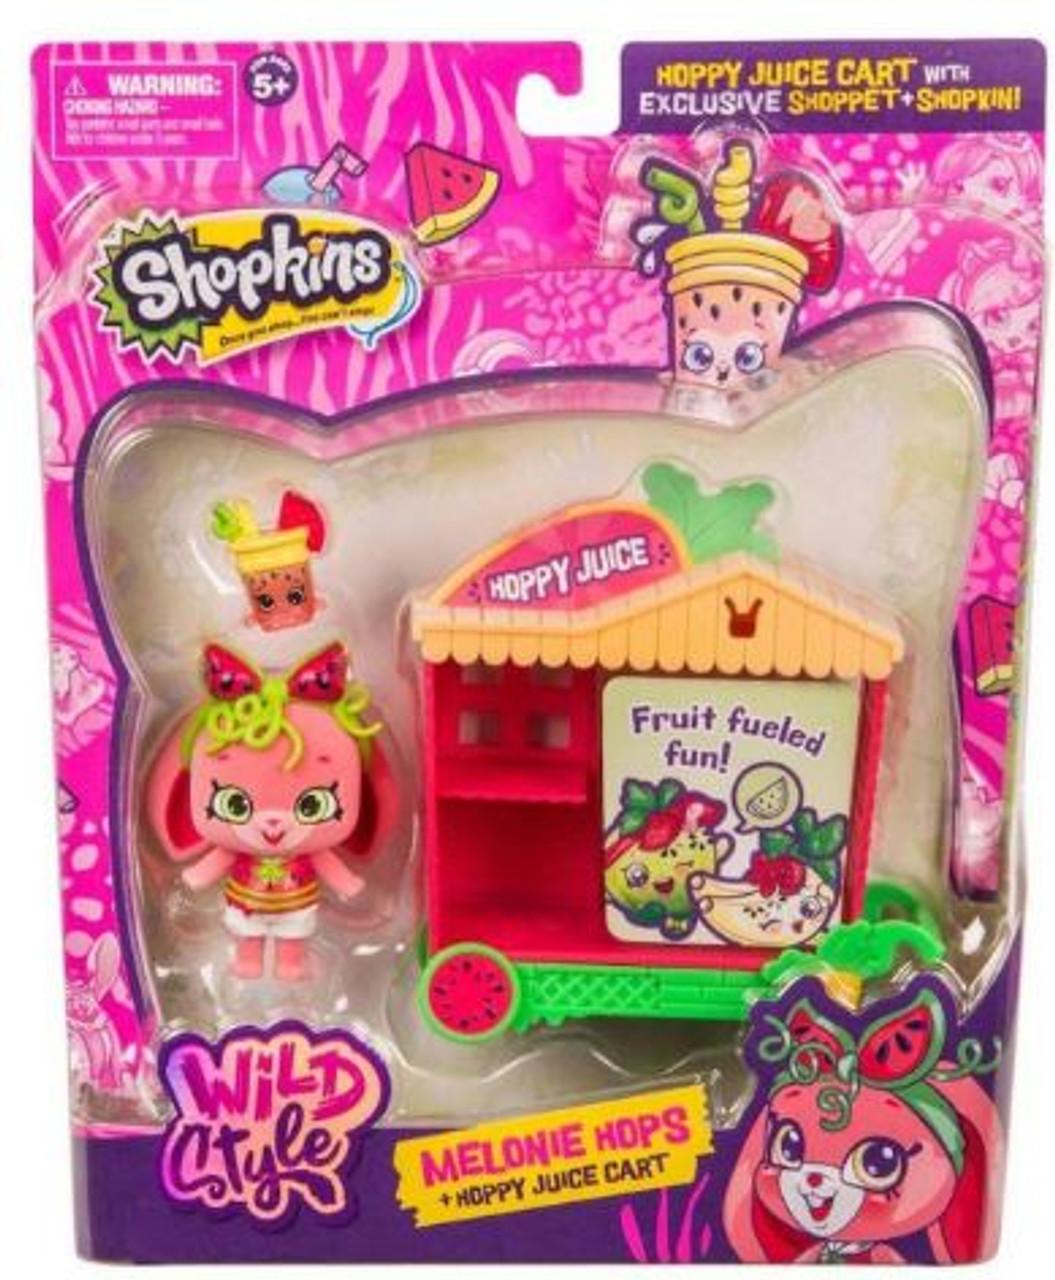 Shopkins Wild Style Melonie Hops & Hoppy Juice Cart